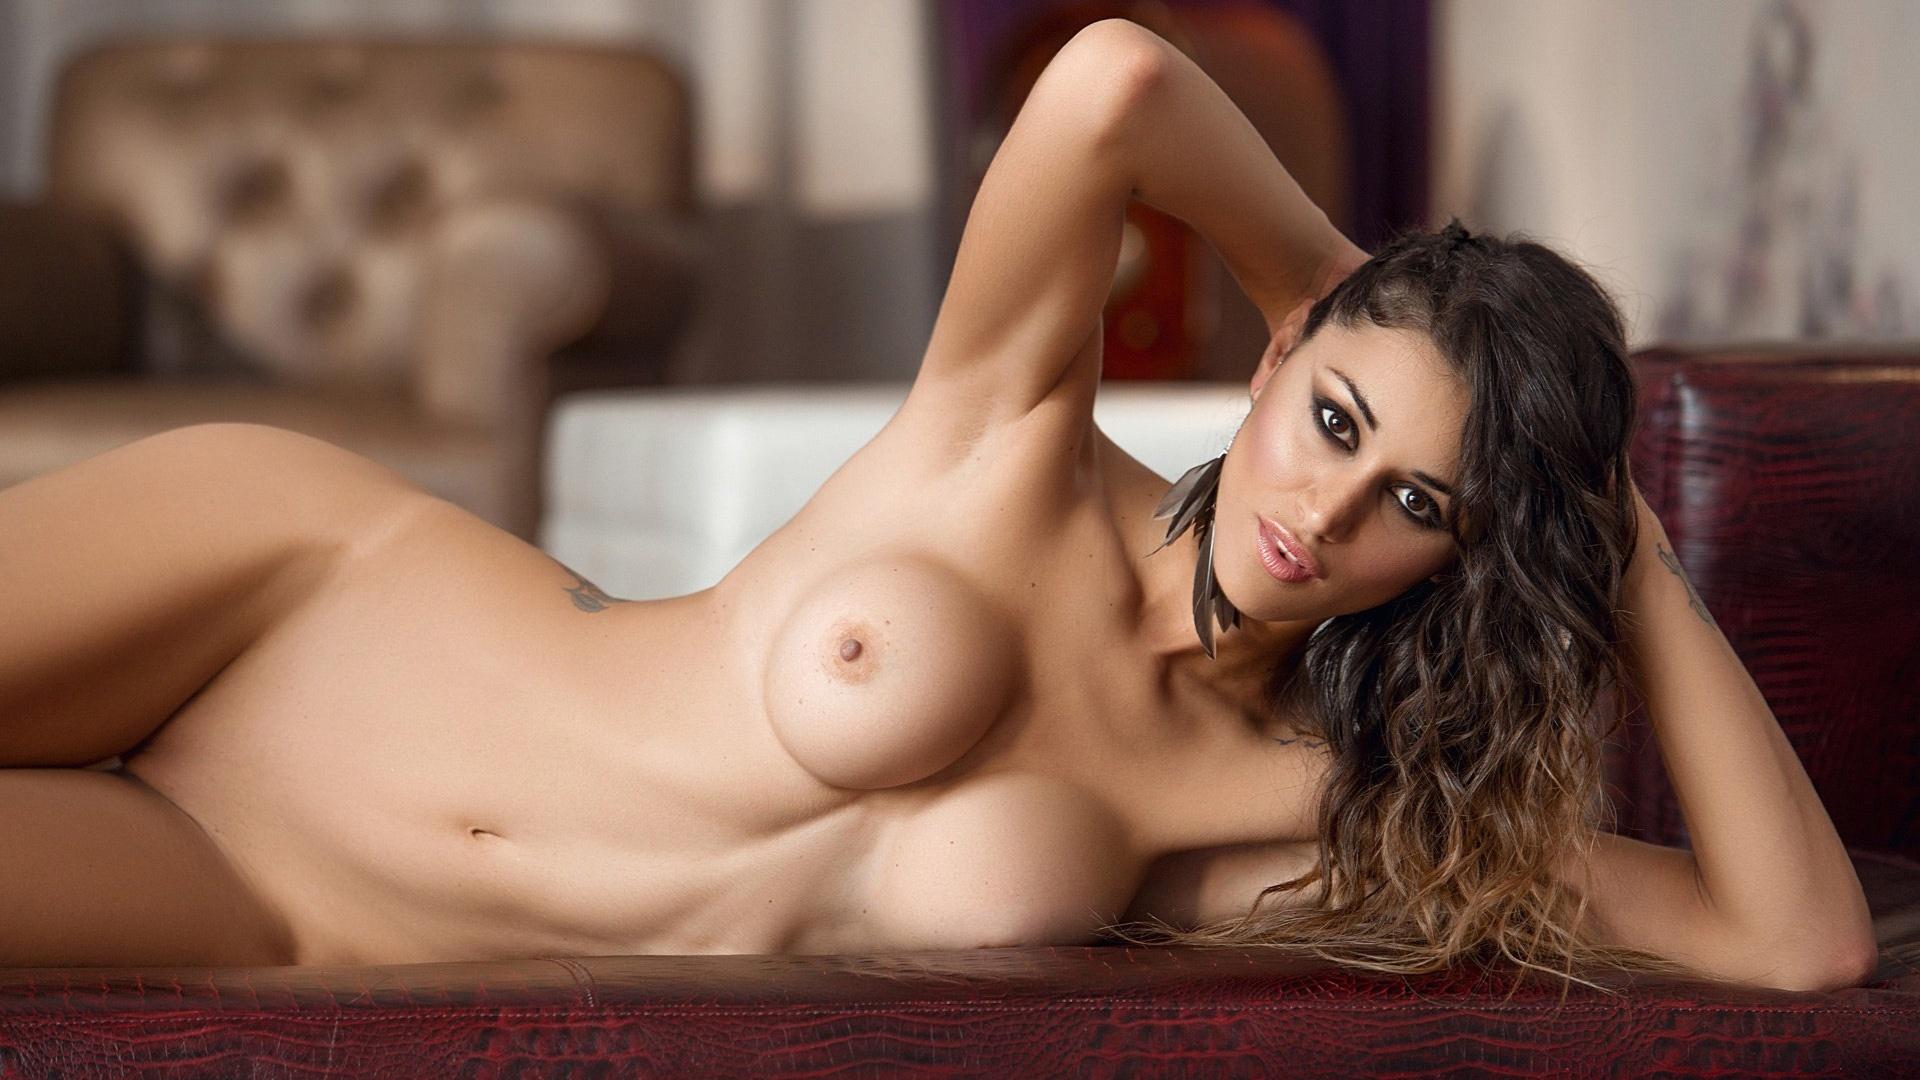 Jennifer nettles nude pic